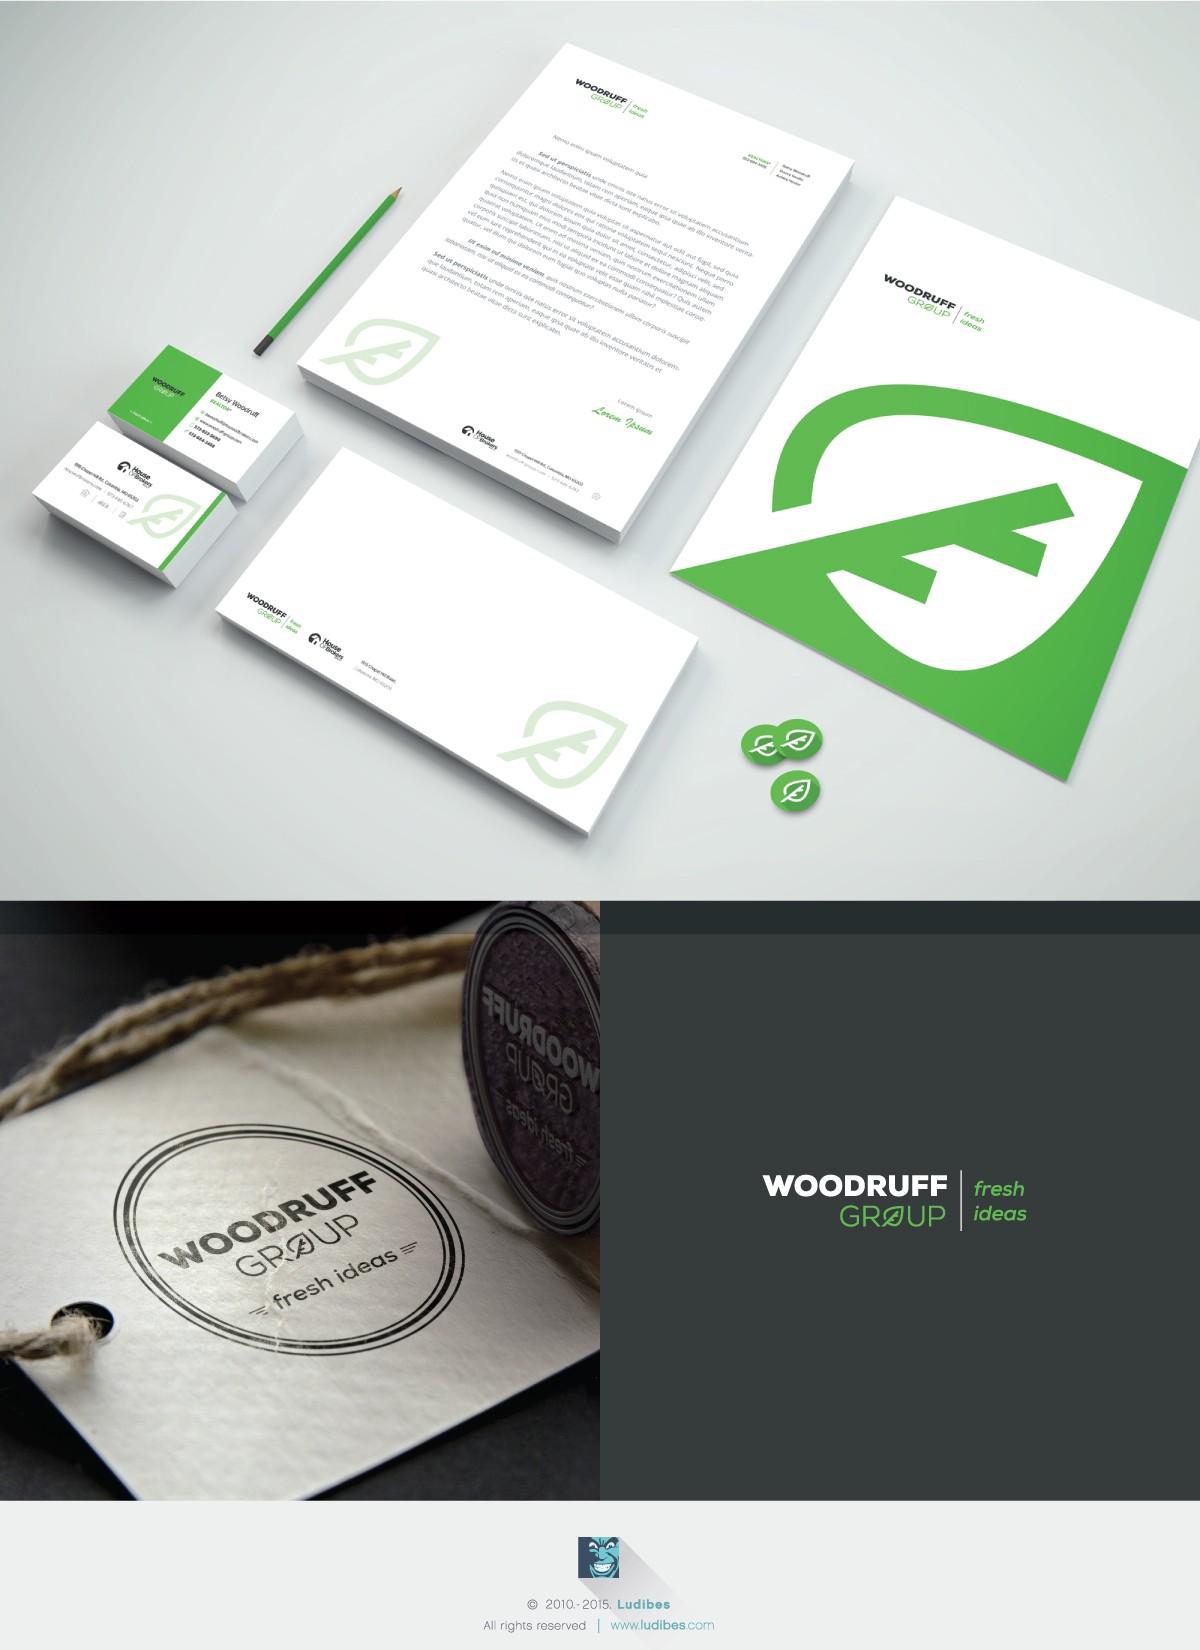 Woodruff Group identity package